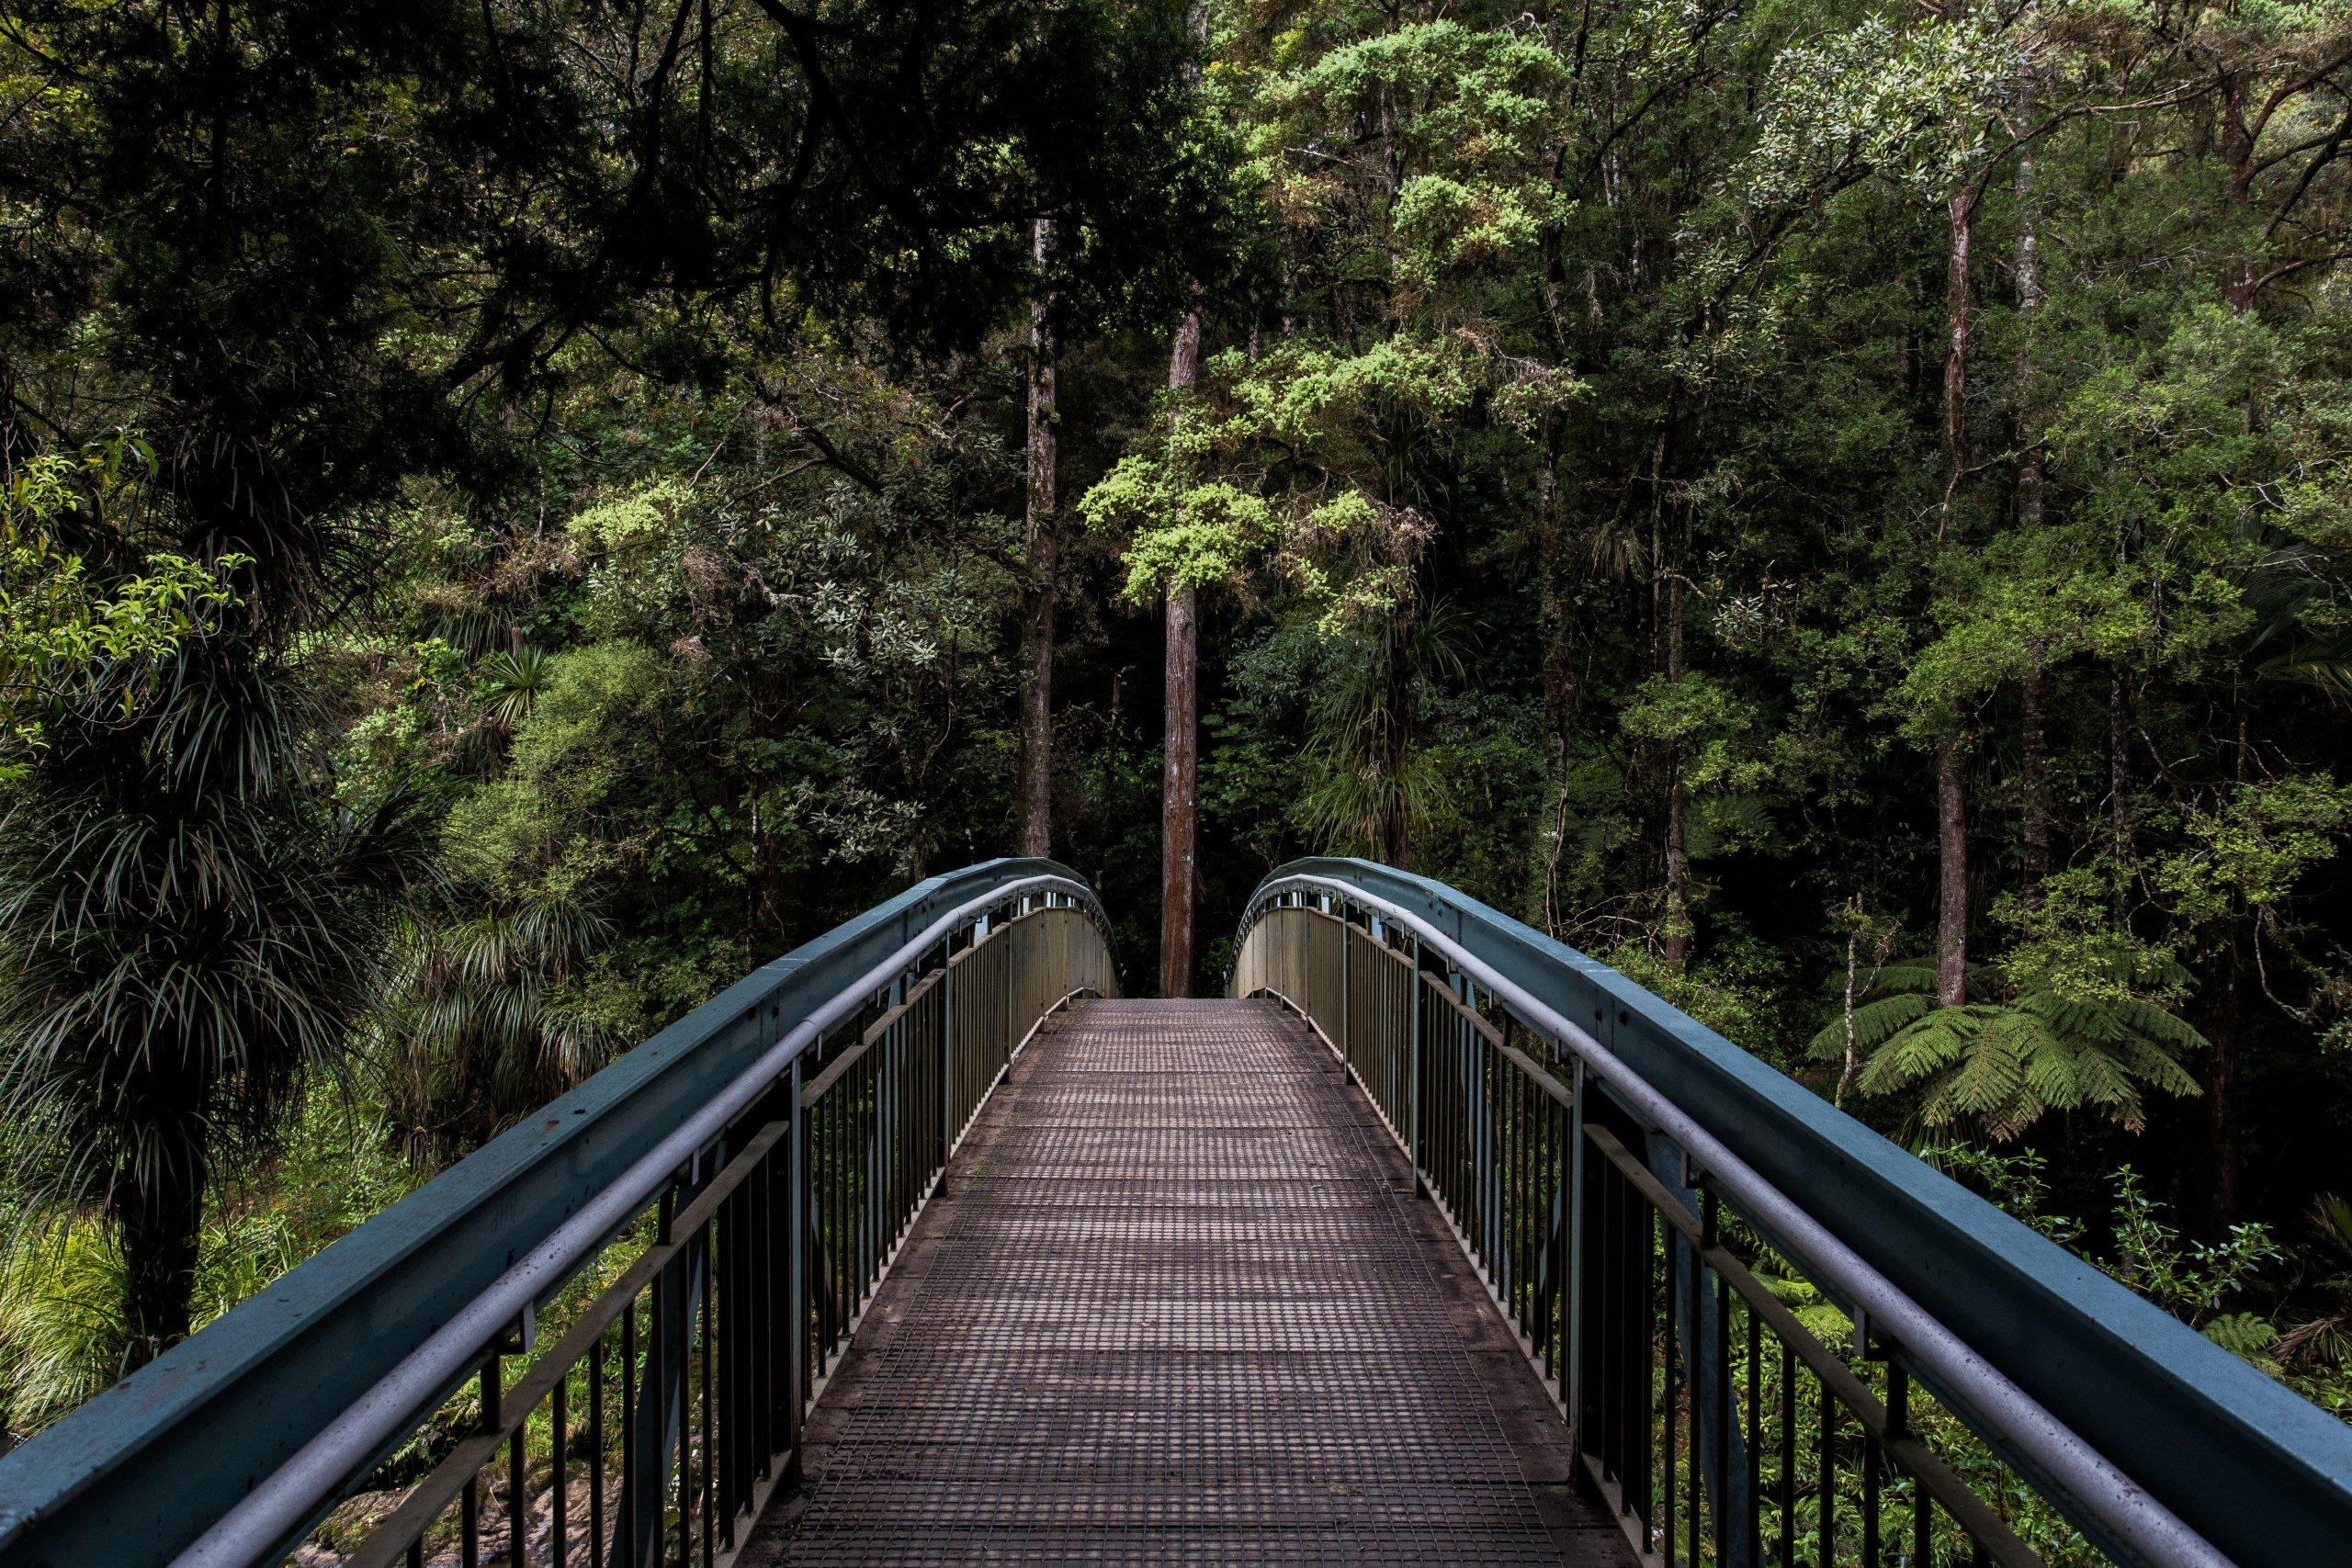 Bridge into wildness